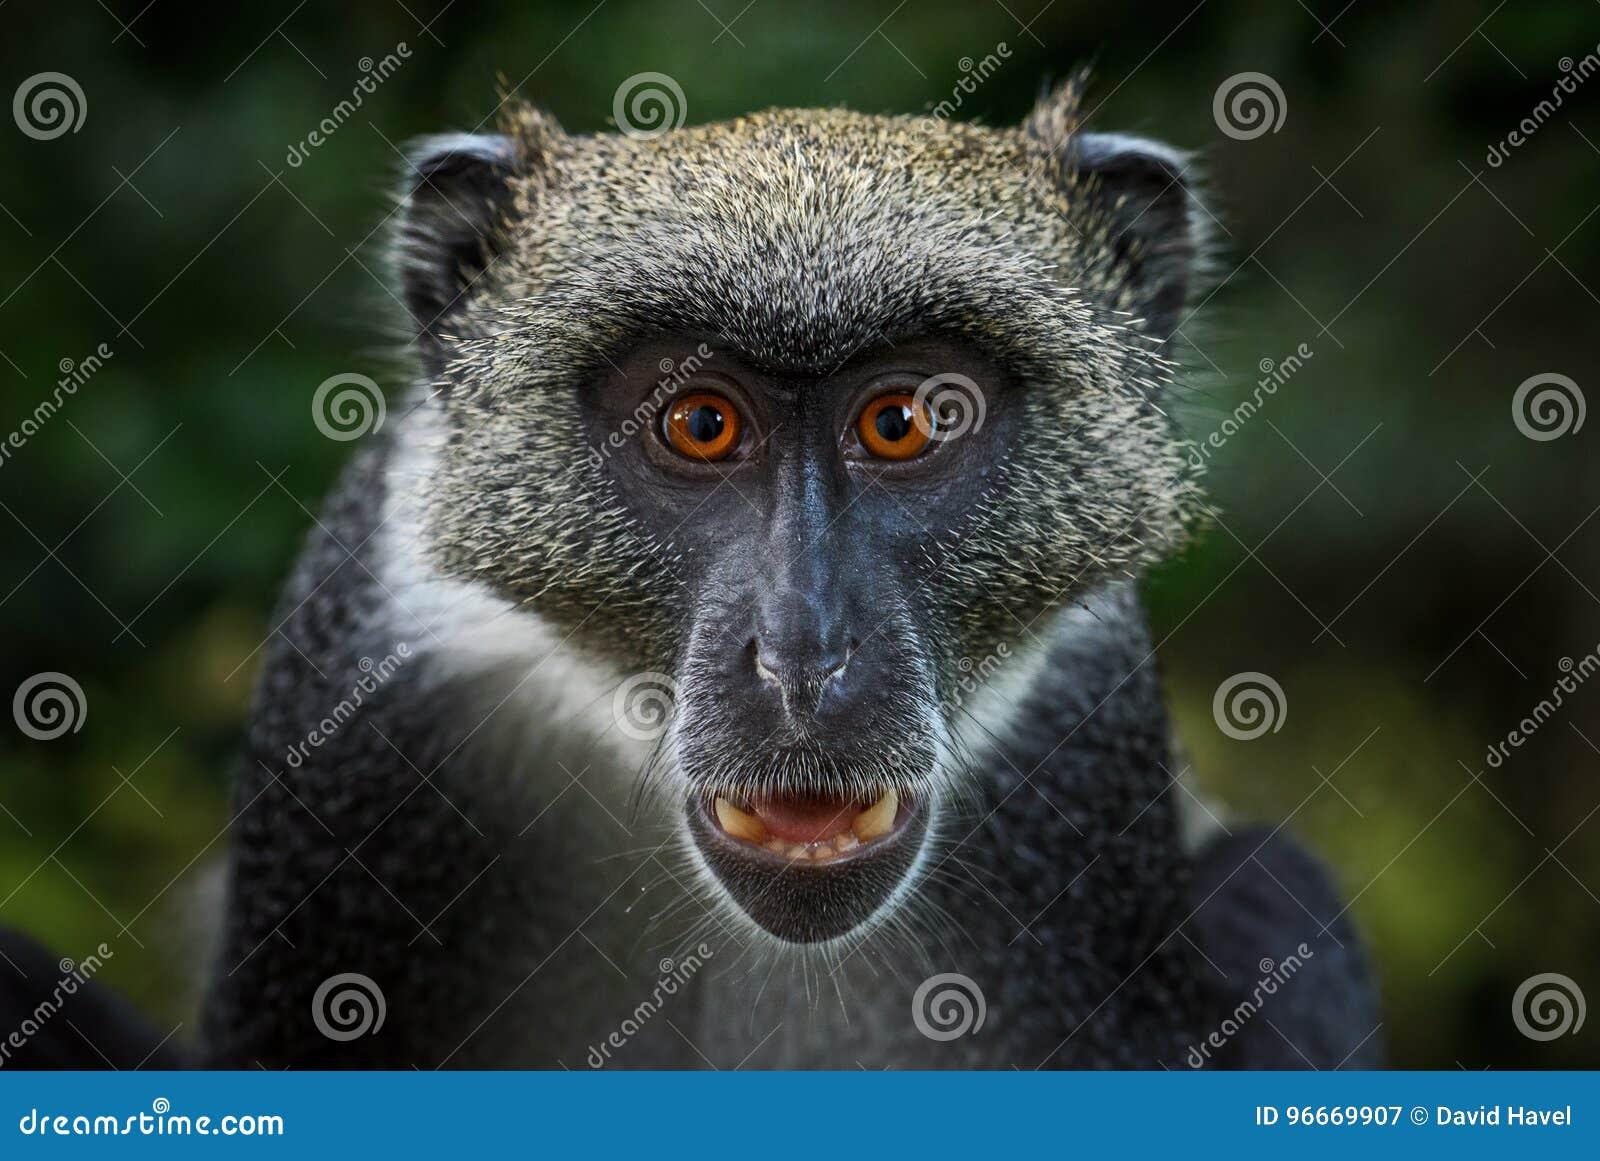 Blue Monkey - Cercopithecus mitis, Kenya, Africa